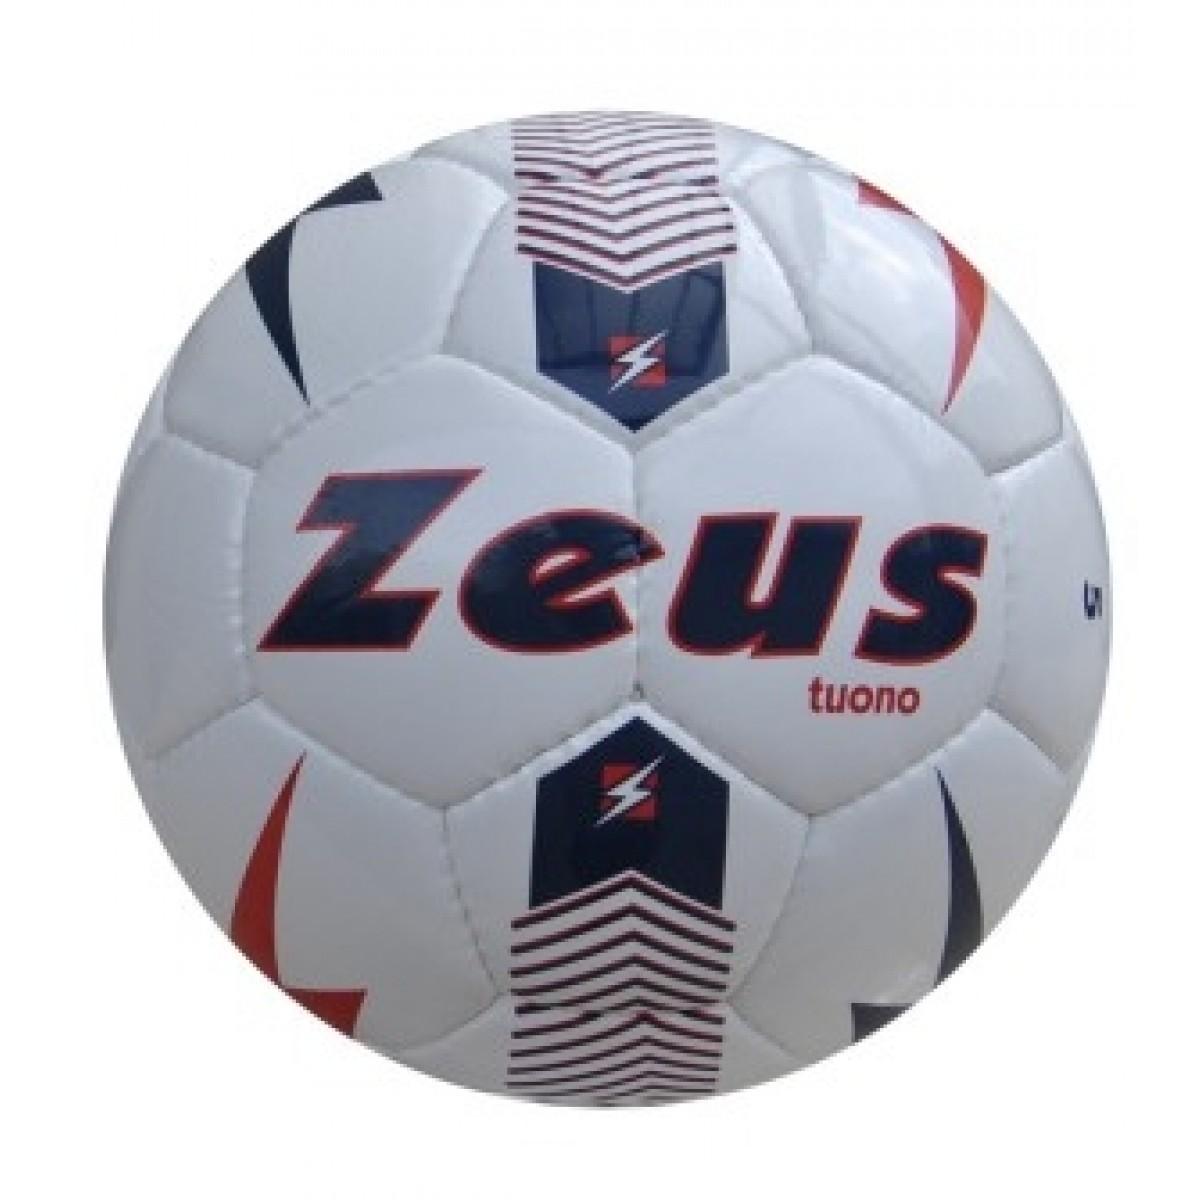 Zeus Tuono fodbold 5